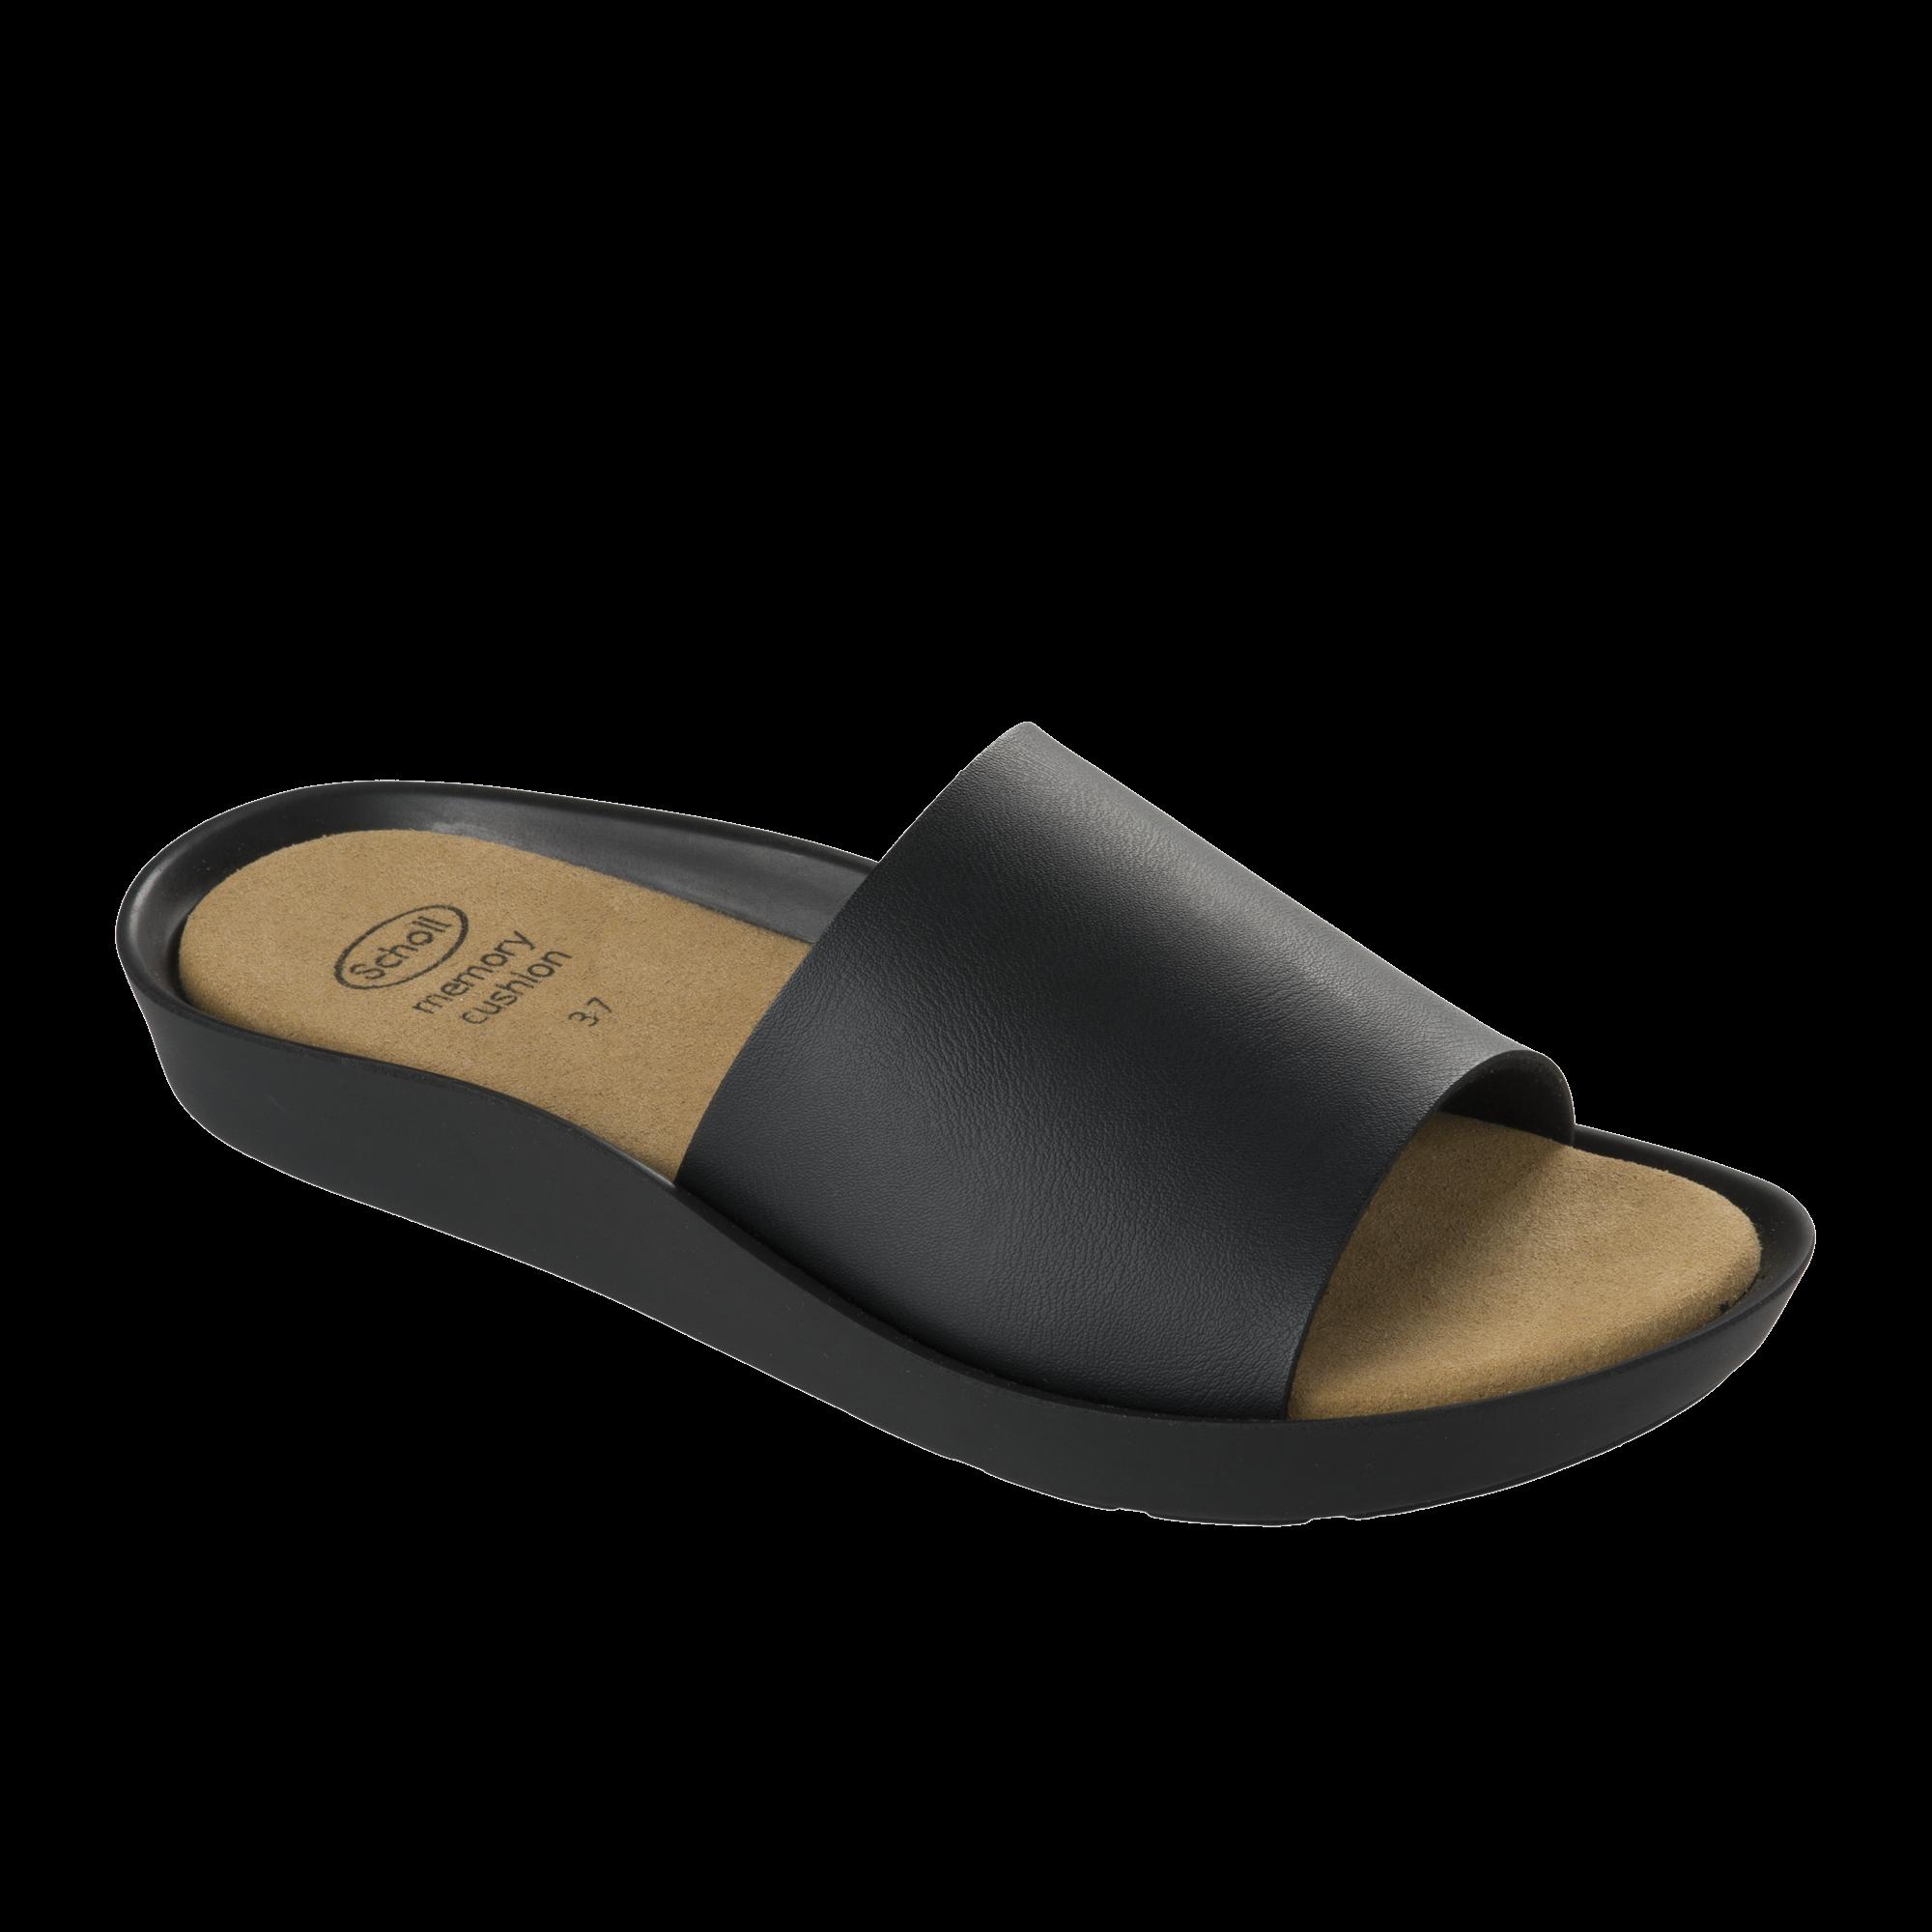 scholl shoes meissa scholl sxqddpx